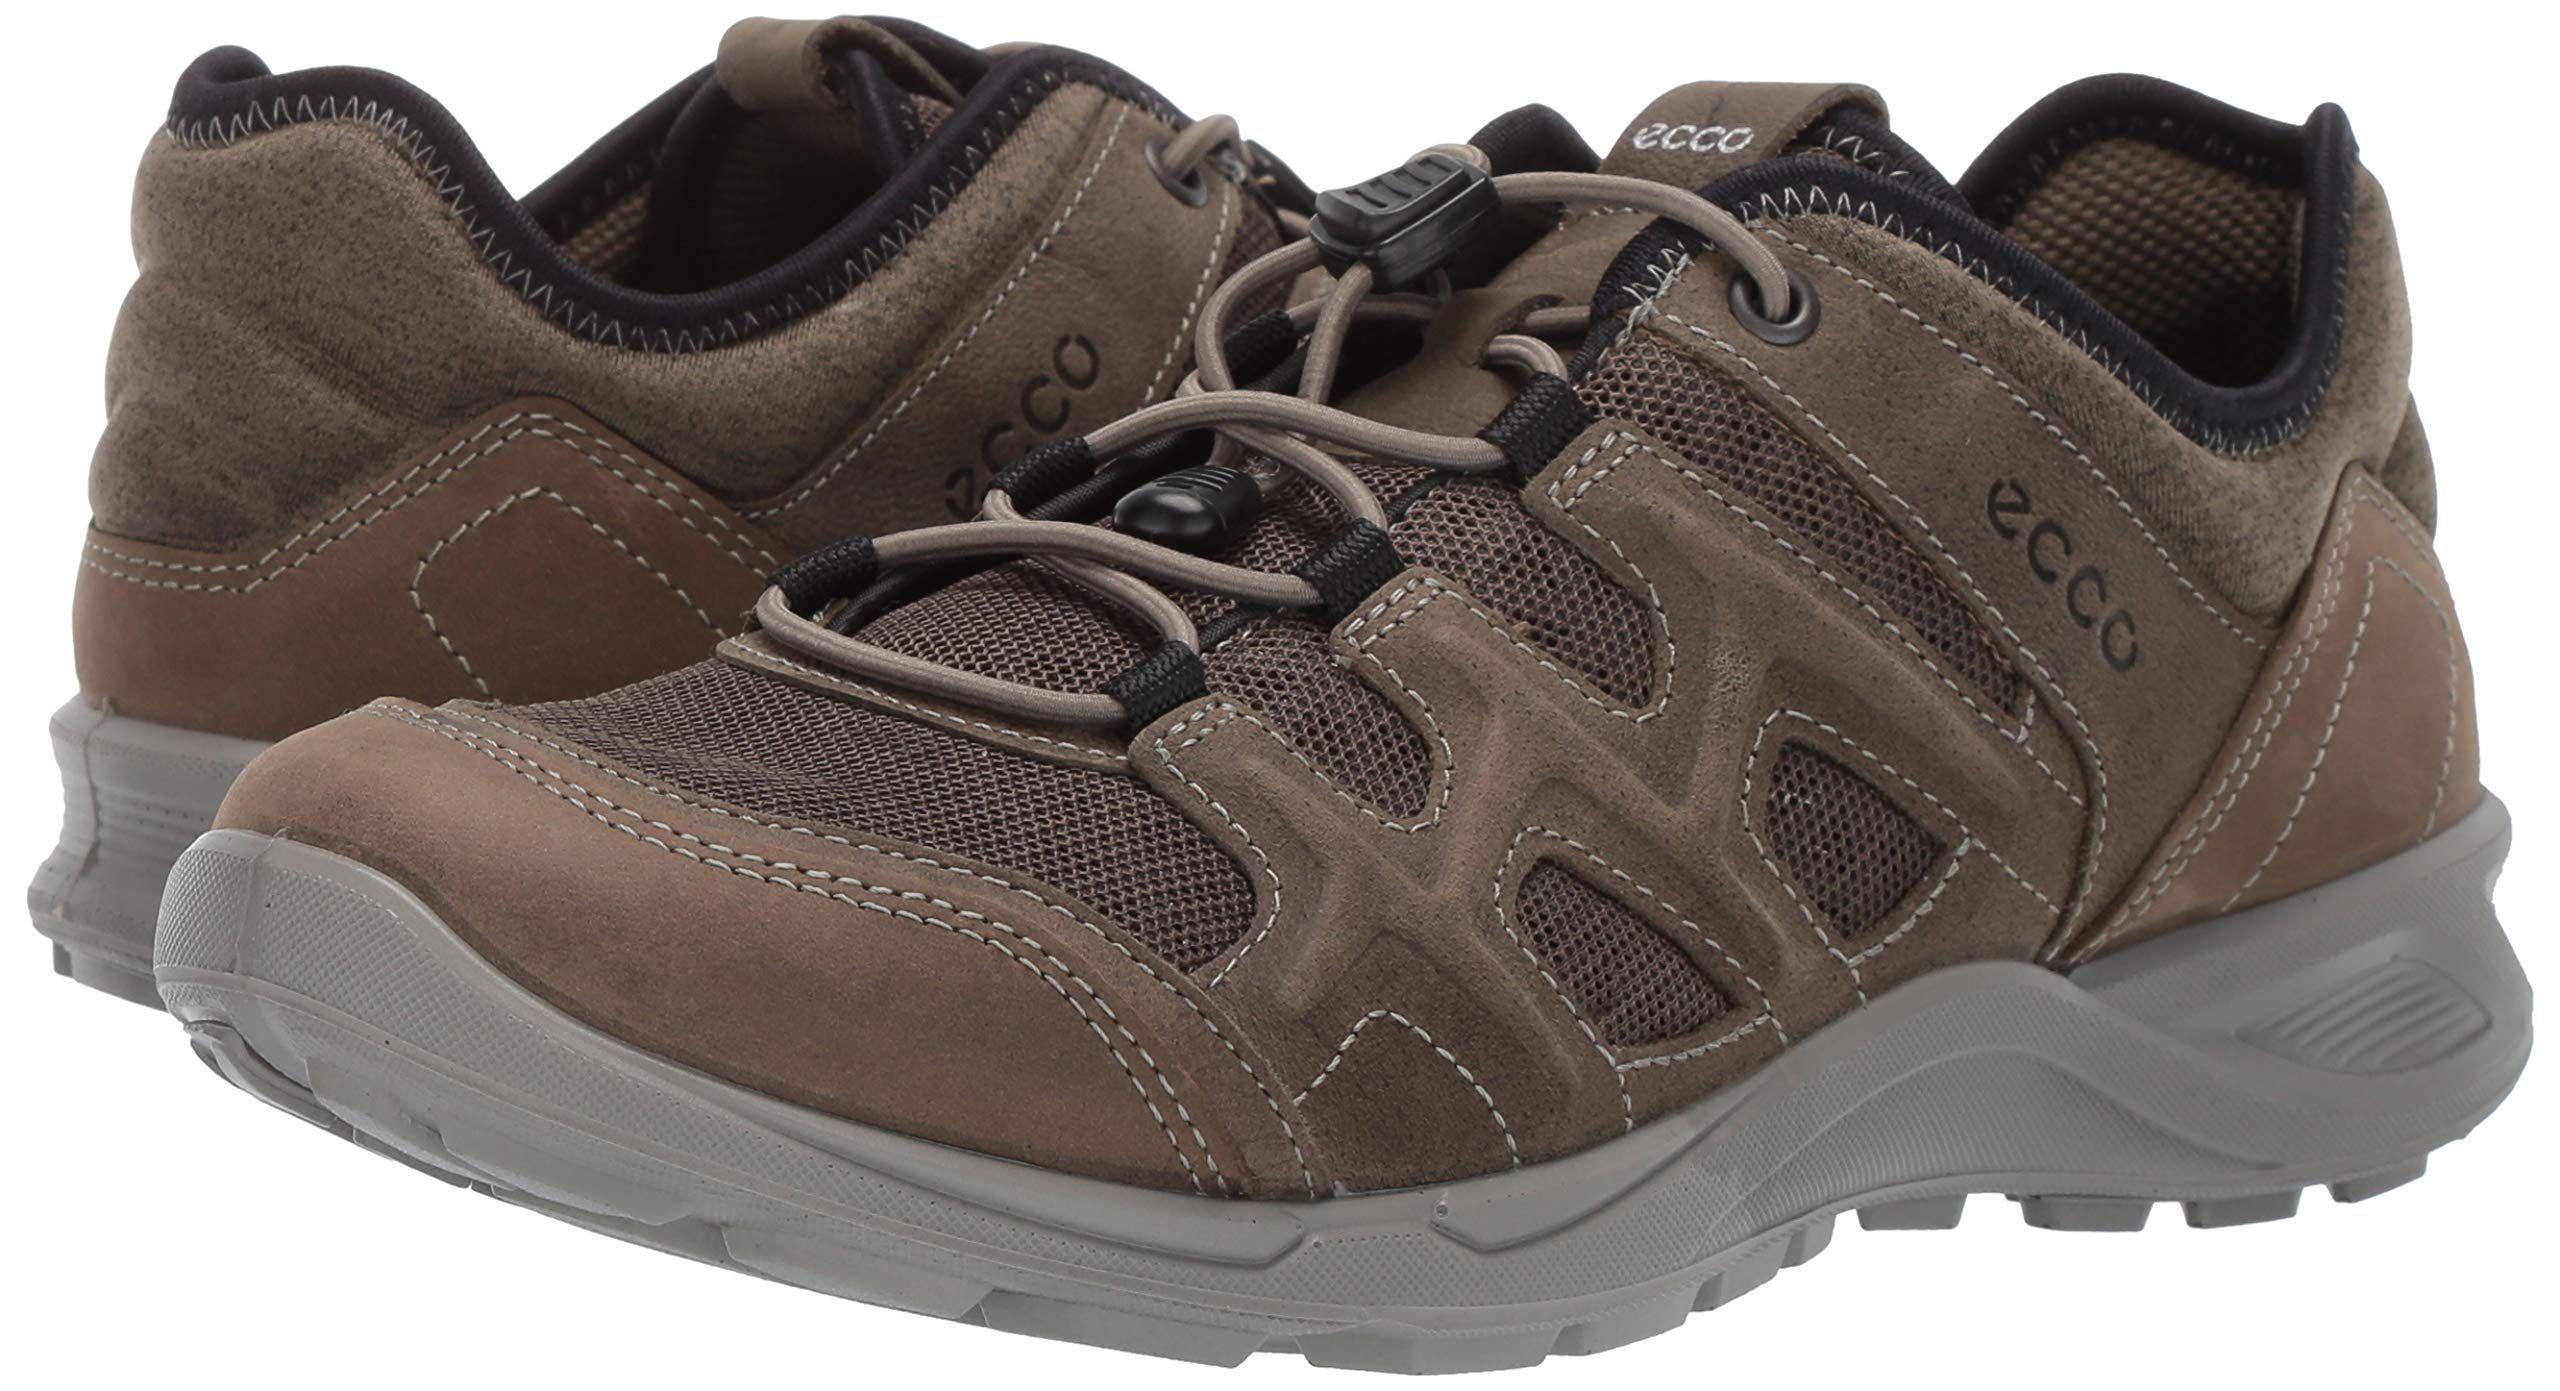 e27bc94bc438 ECCO Mens Terracruise Lite Hiking Shoe Tarmac 40 M EU 66.5 US     For